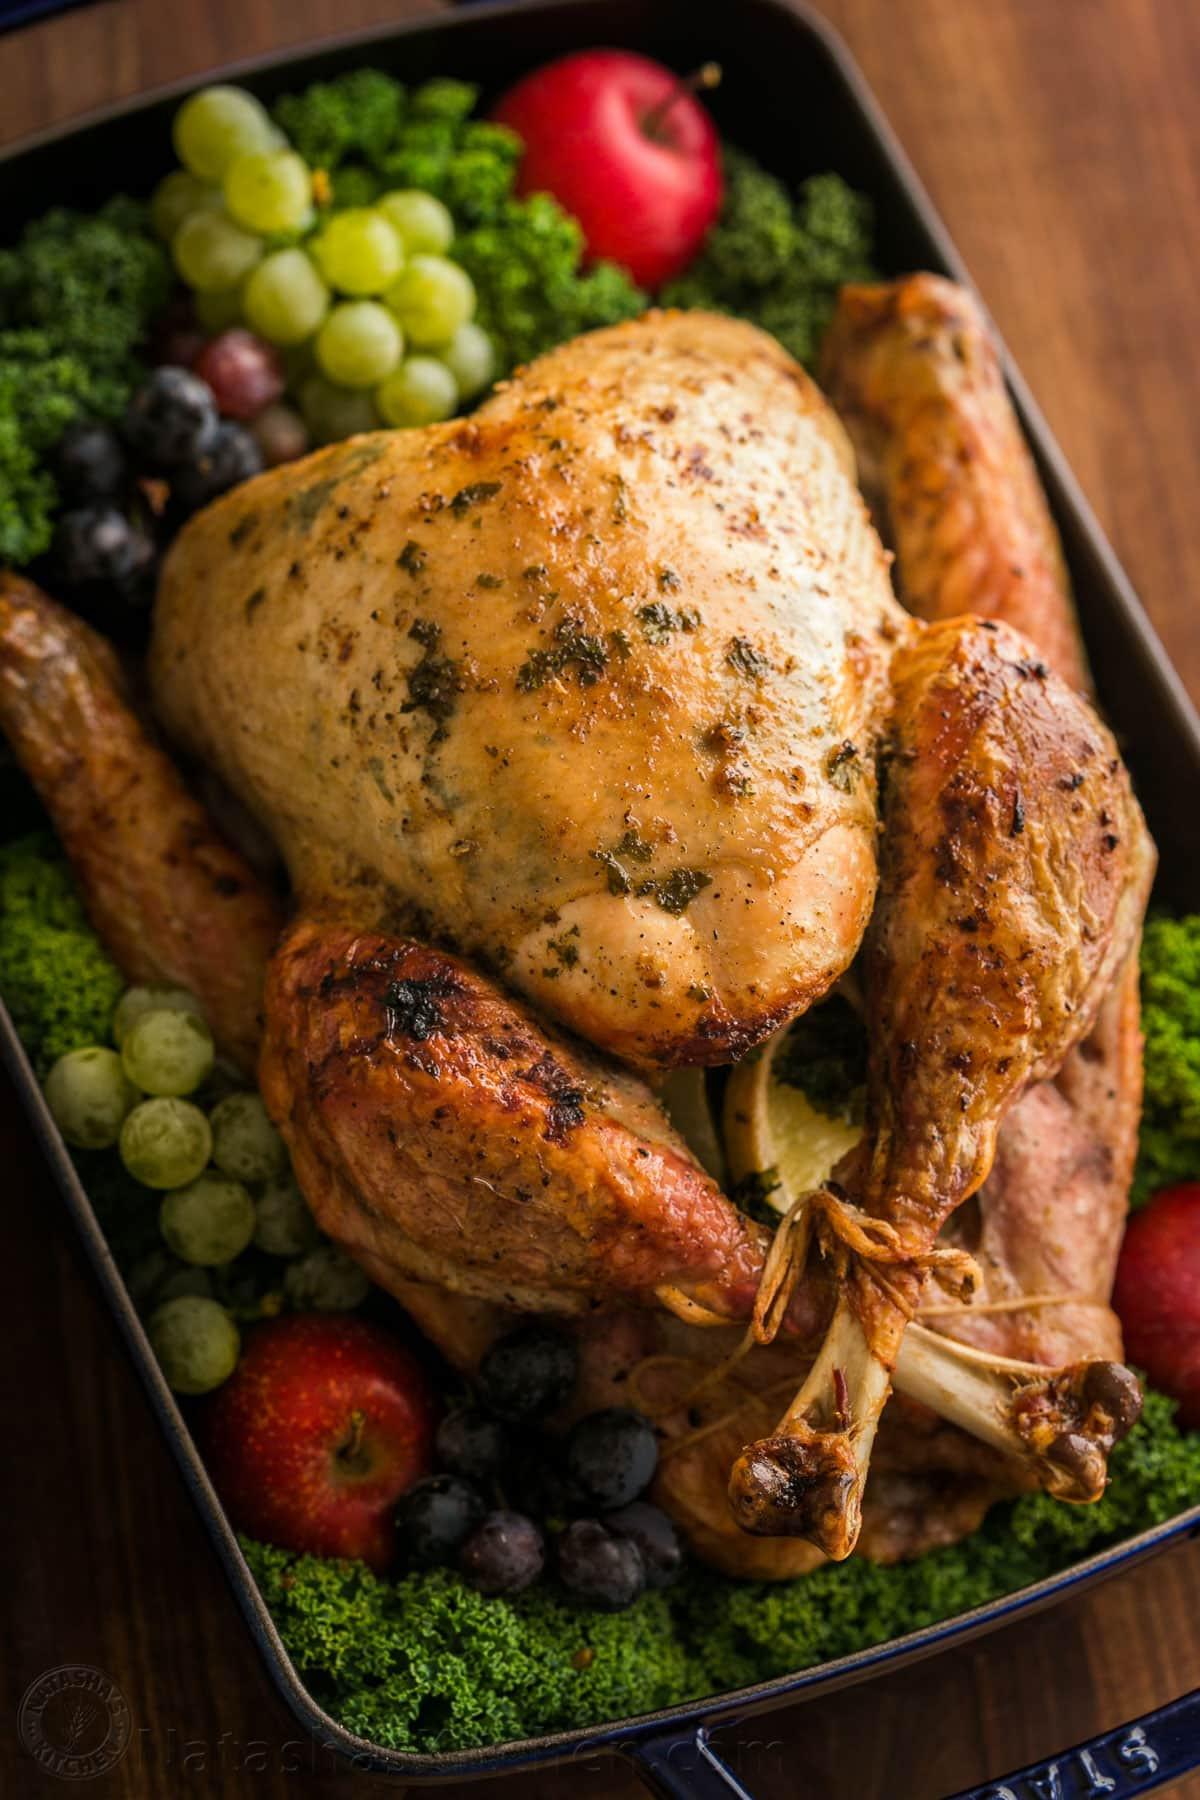 Roasted Turkey Recipes Thanksgiving  Thanksgiving Turkey Recipe VIDEO NatashasKitchen